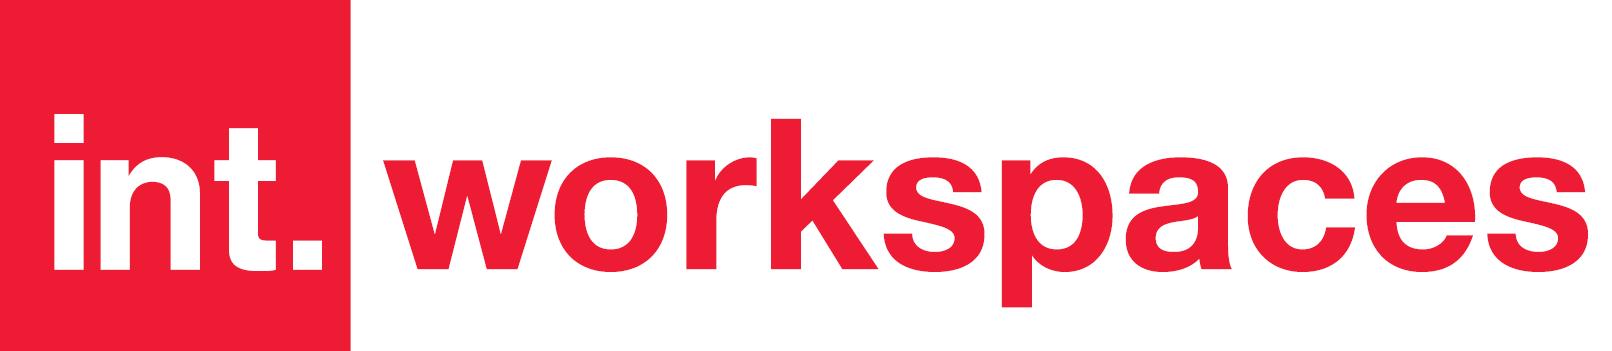 Int Workspaces